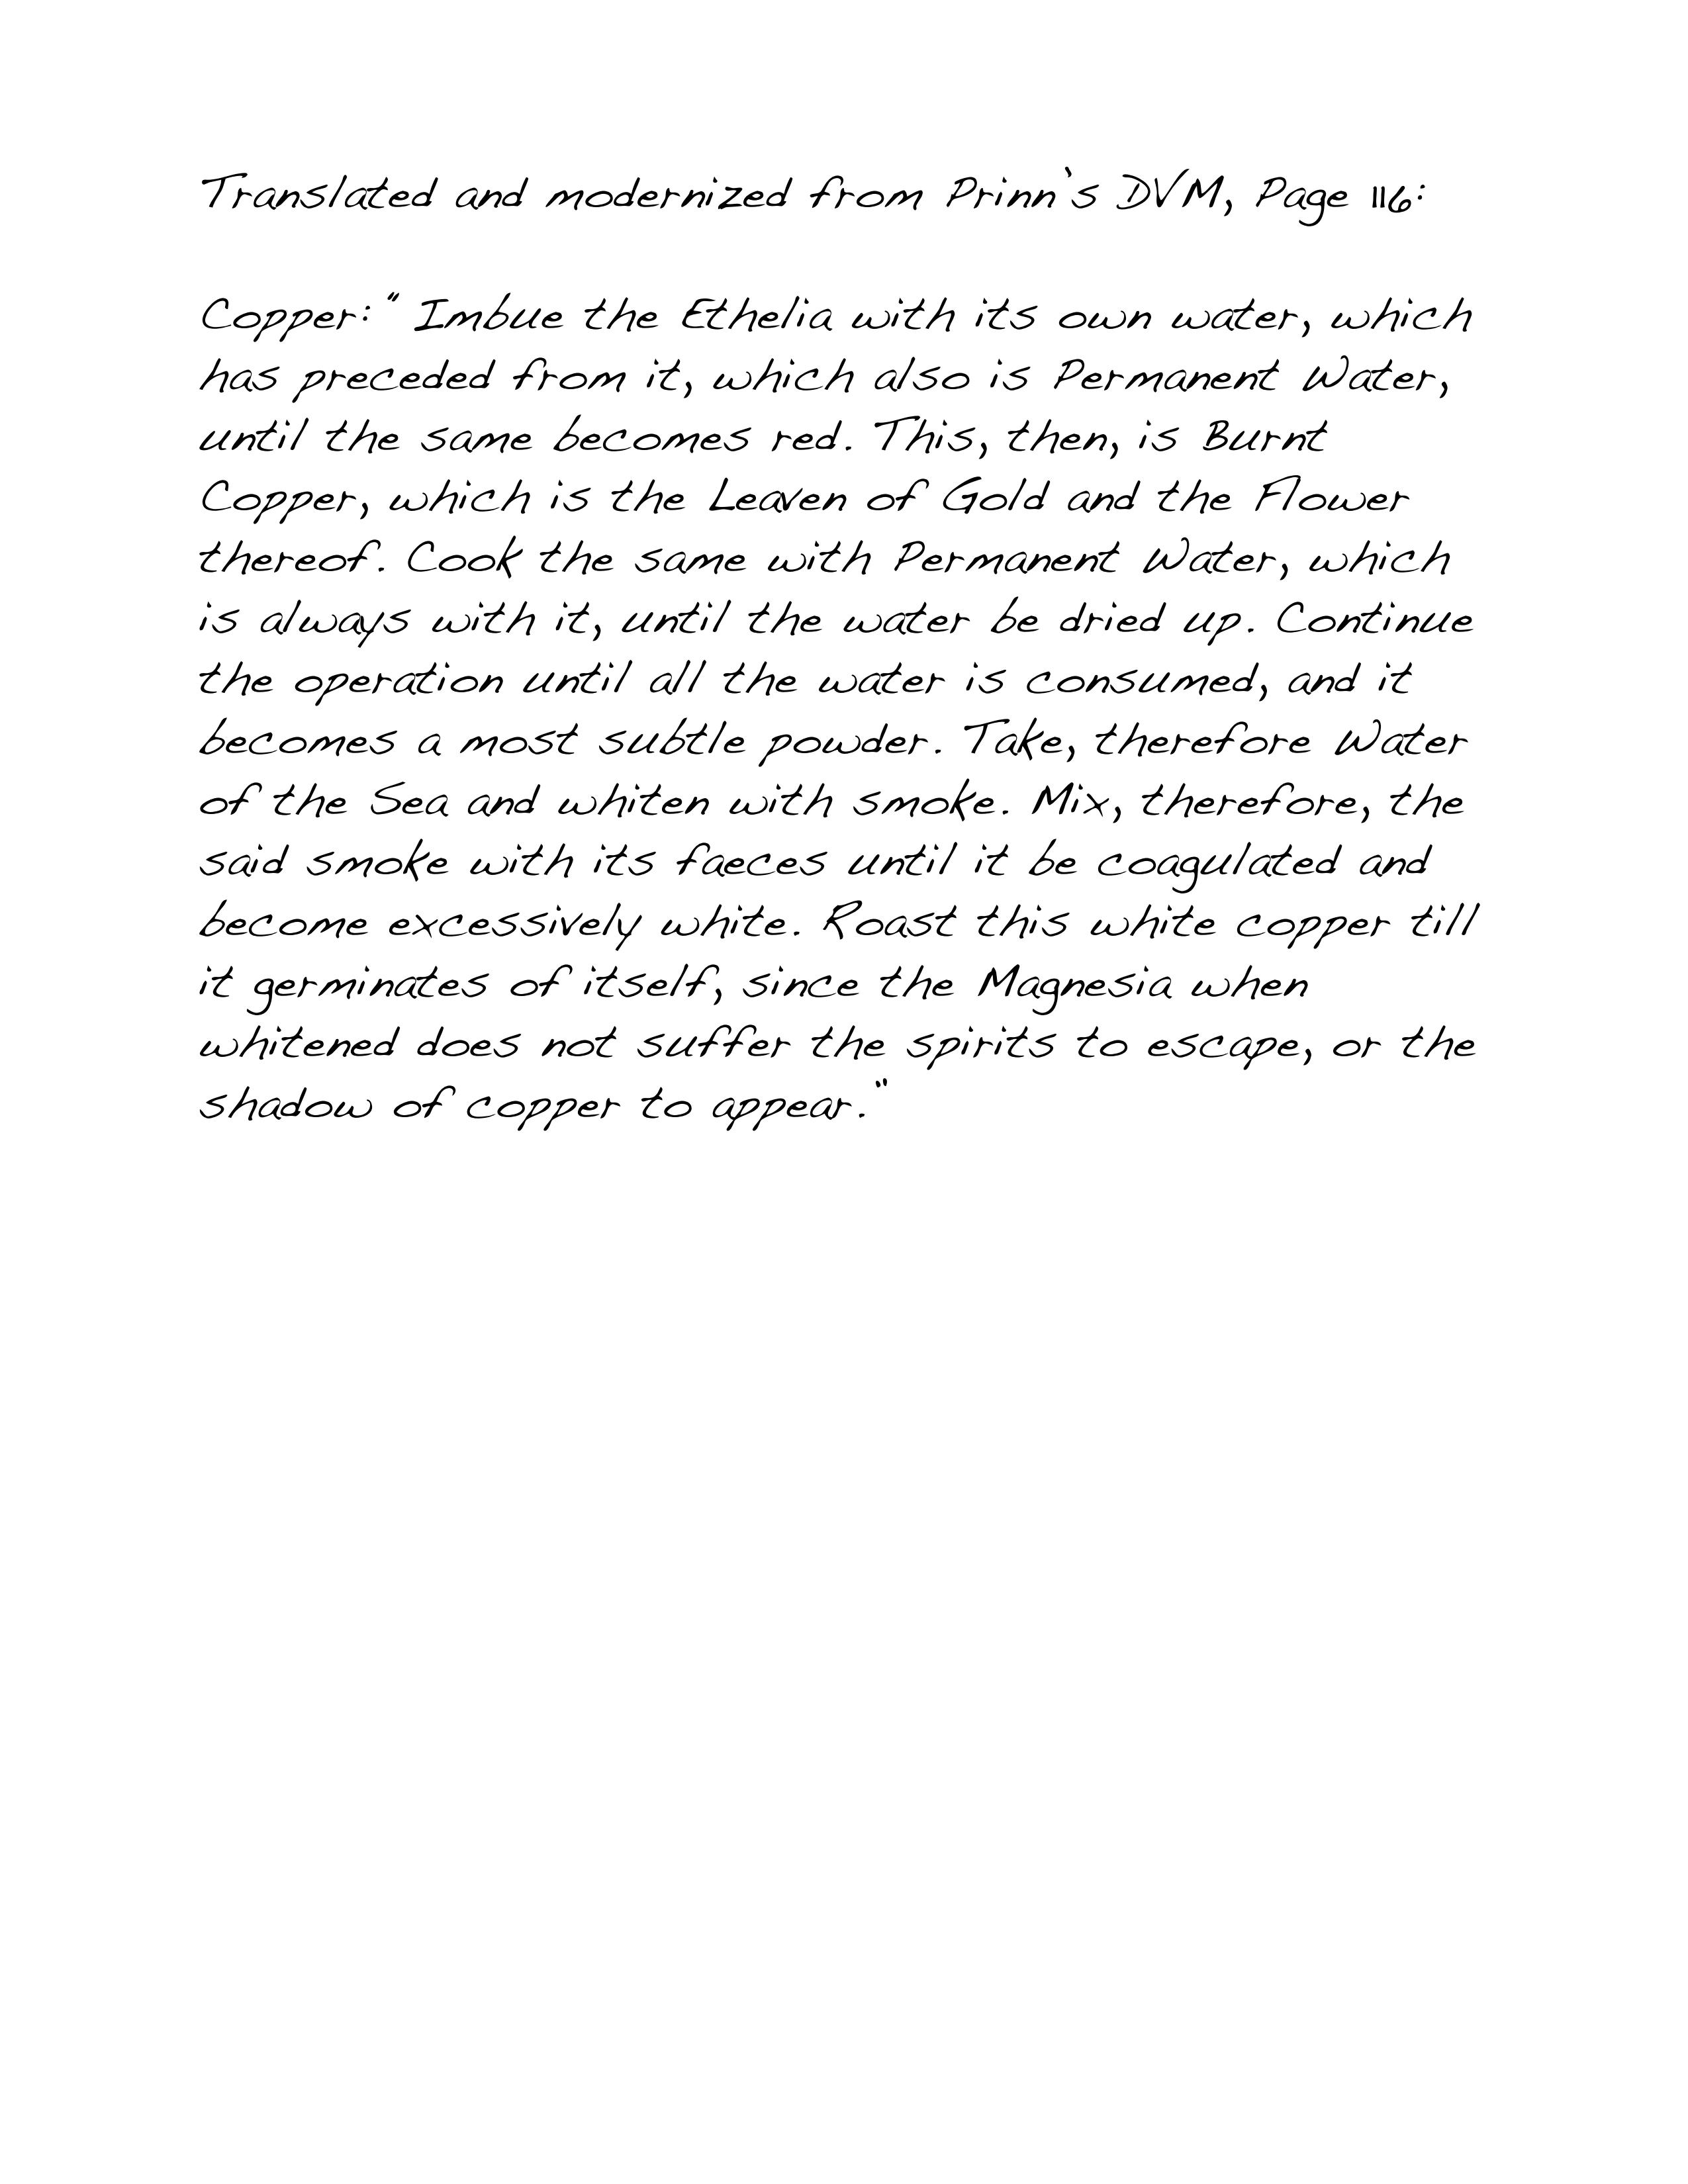 De vermis mysteriis page 6